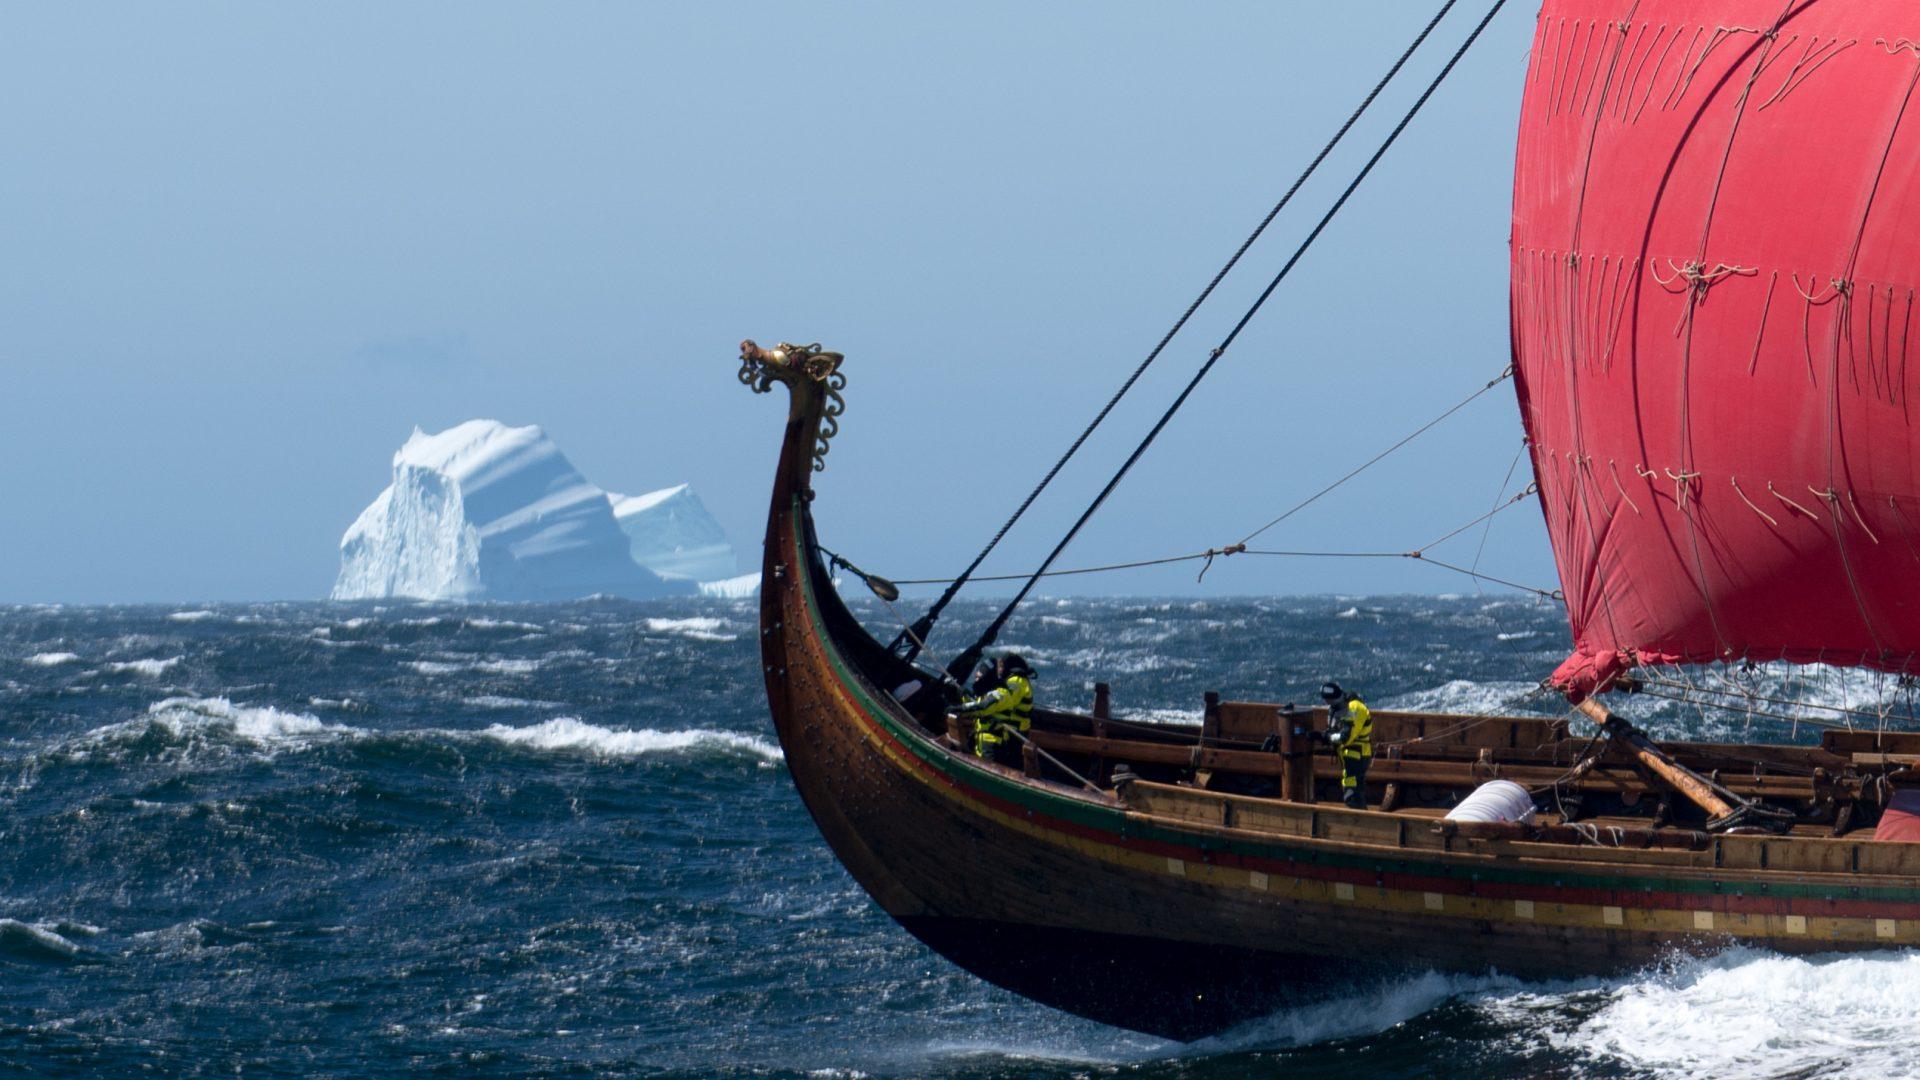 11-DSC7017Leaving-Greenland-2-1920x1080.jpg